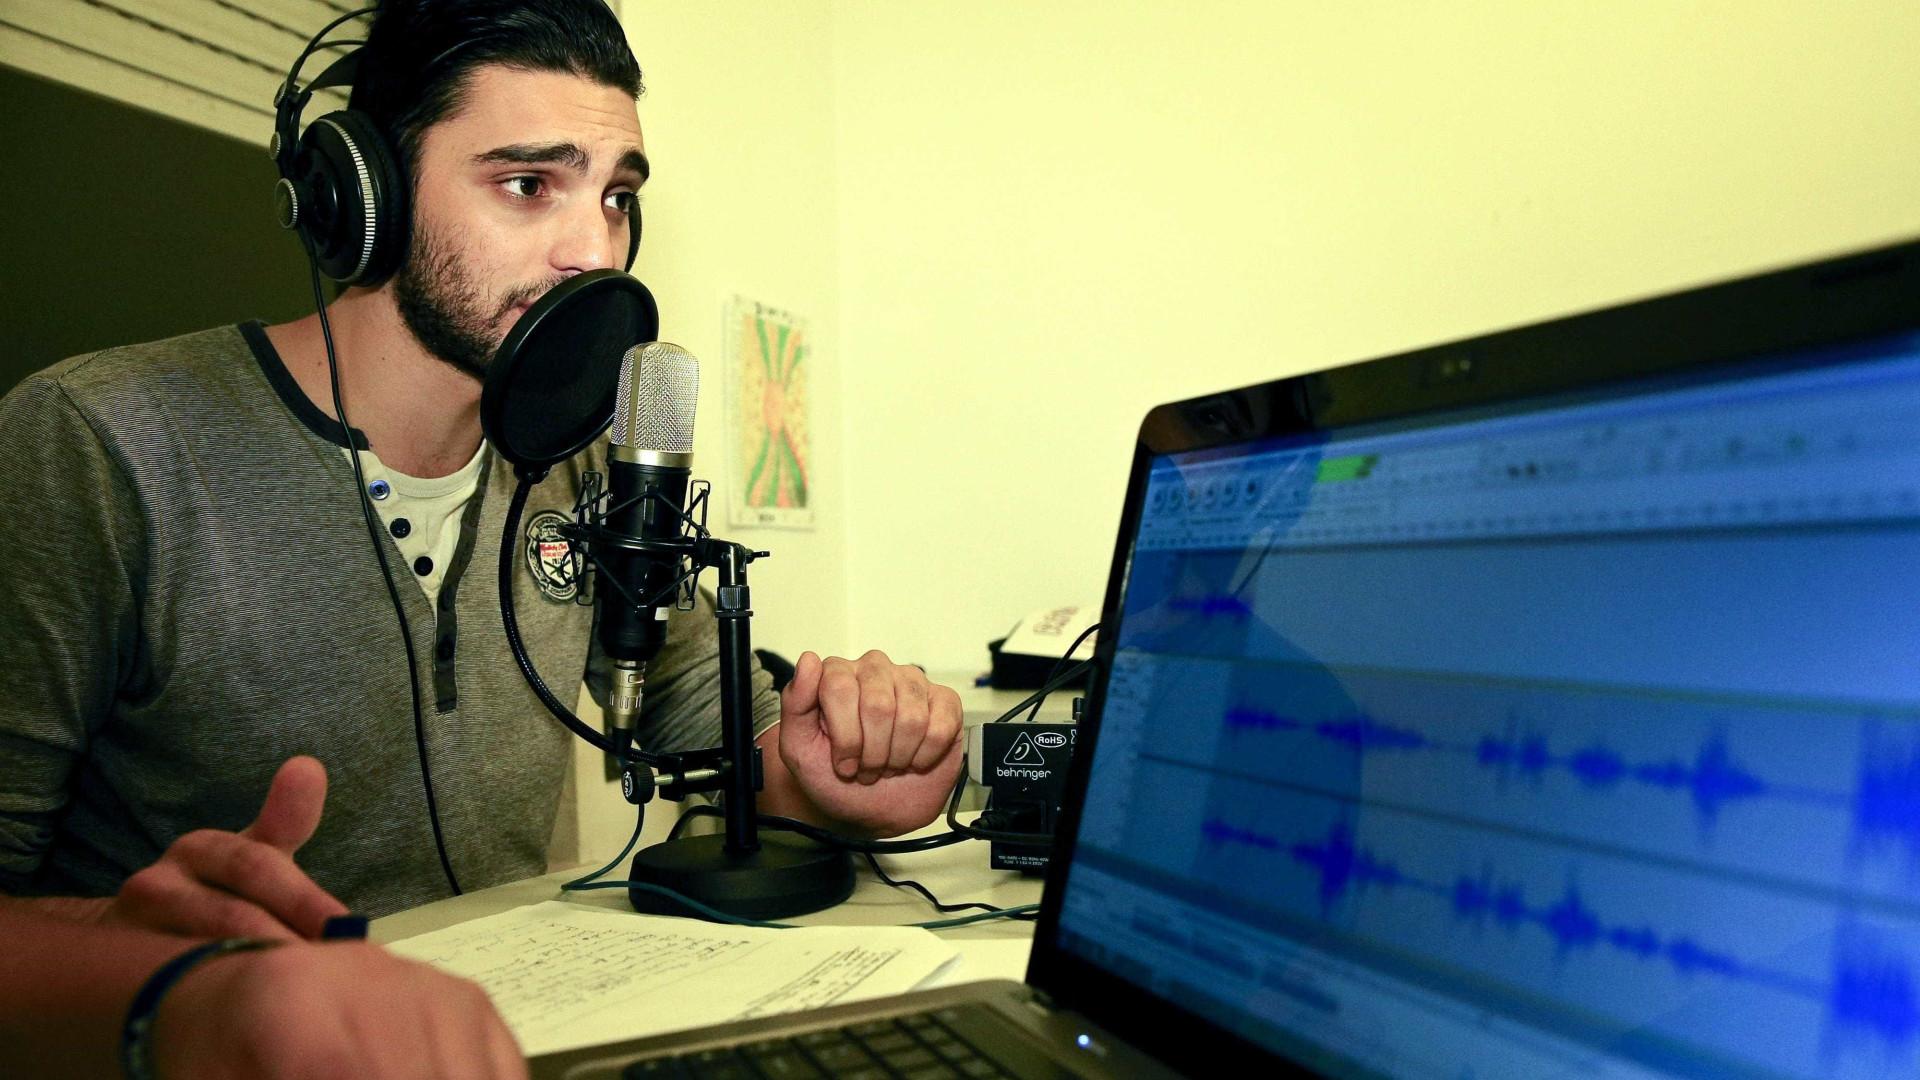 Projecto europeu utiliza a rádio para formar e dar voz a jovens